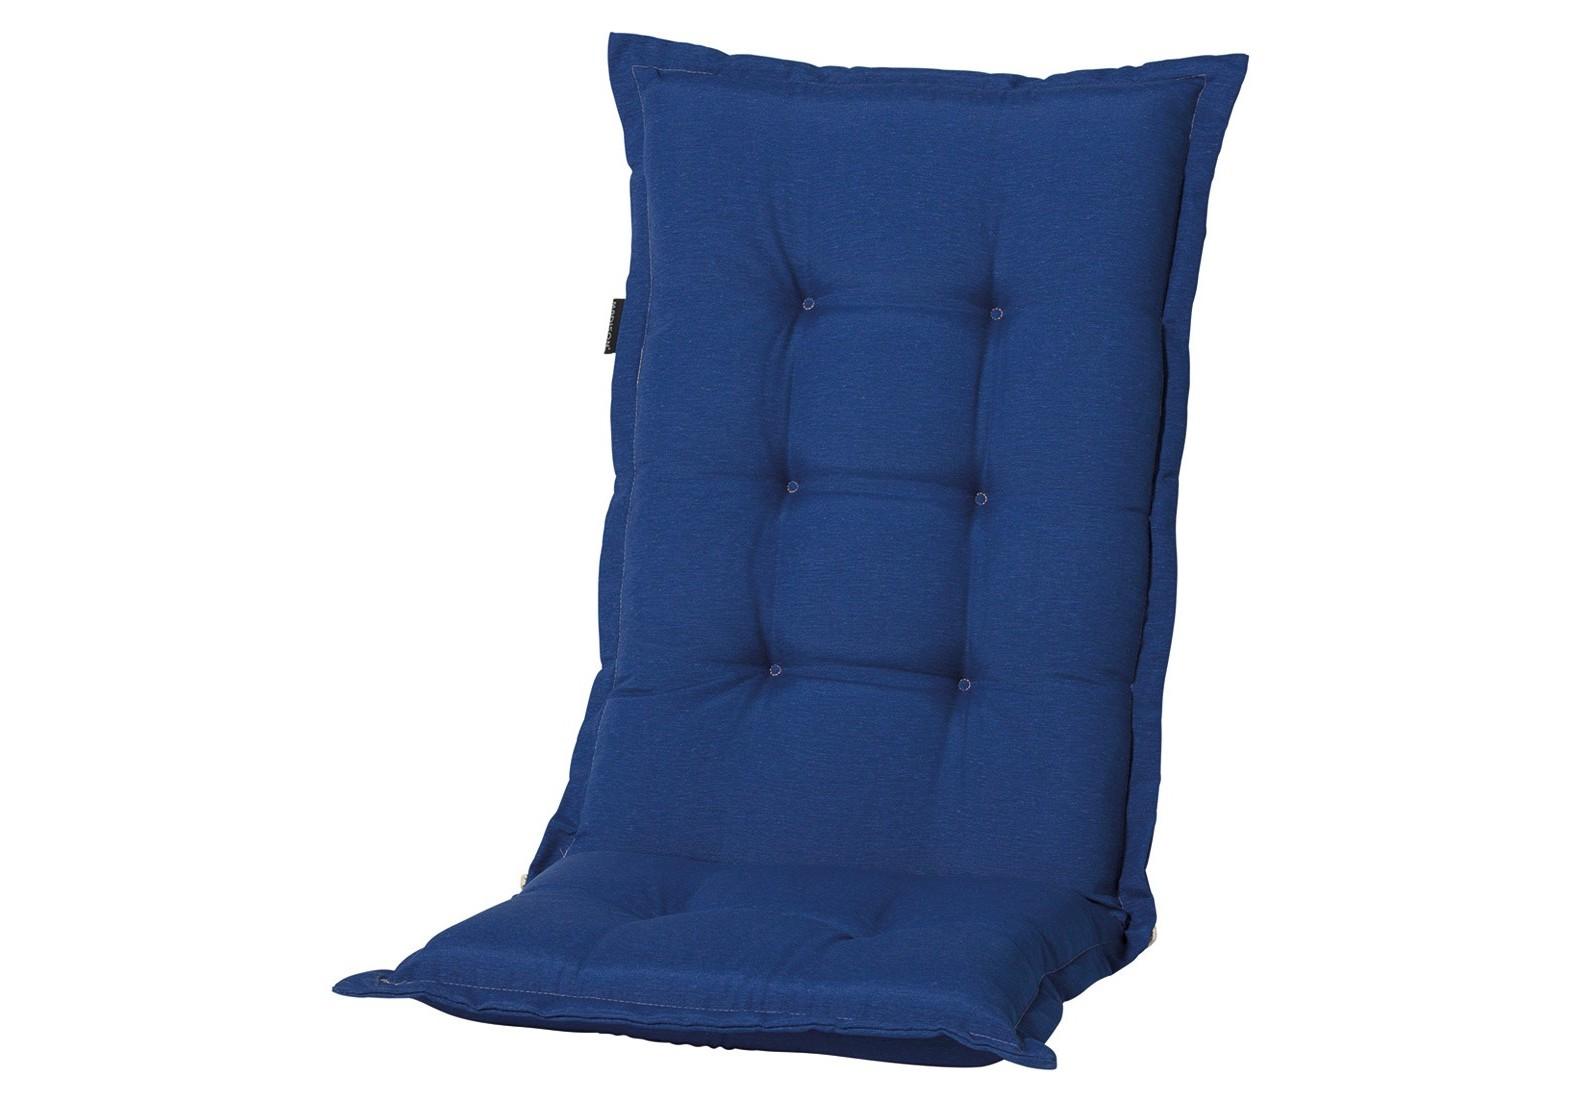 Подушка для кресла AzzuraКресла для сада<br>Подушка для кресла со спинкой Azzura. Наполнитель холлофайбер<br><br>Material: Текстиль<br>Length см: None<br>Width см: 123<br>Depth см: 50<br>Height см: 8